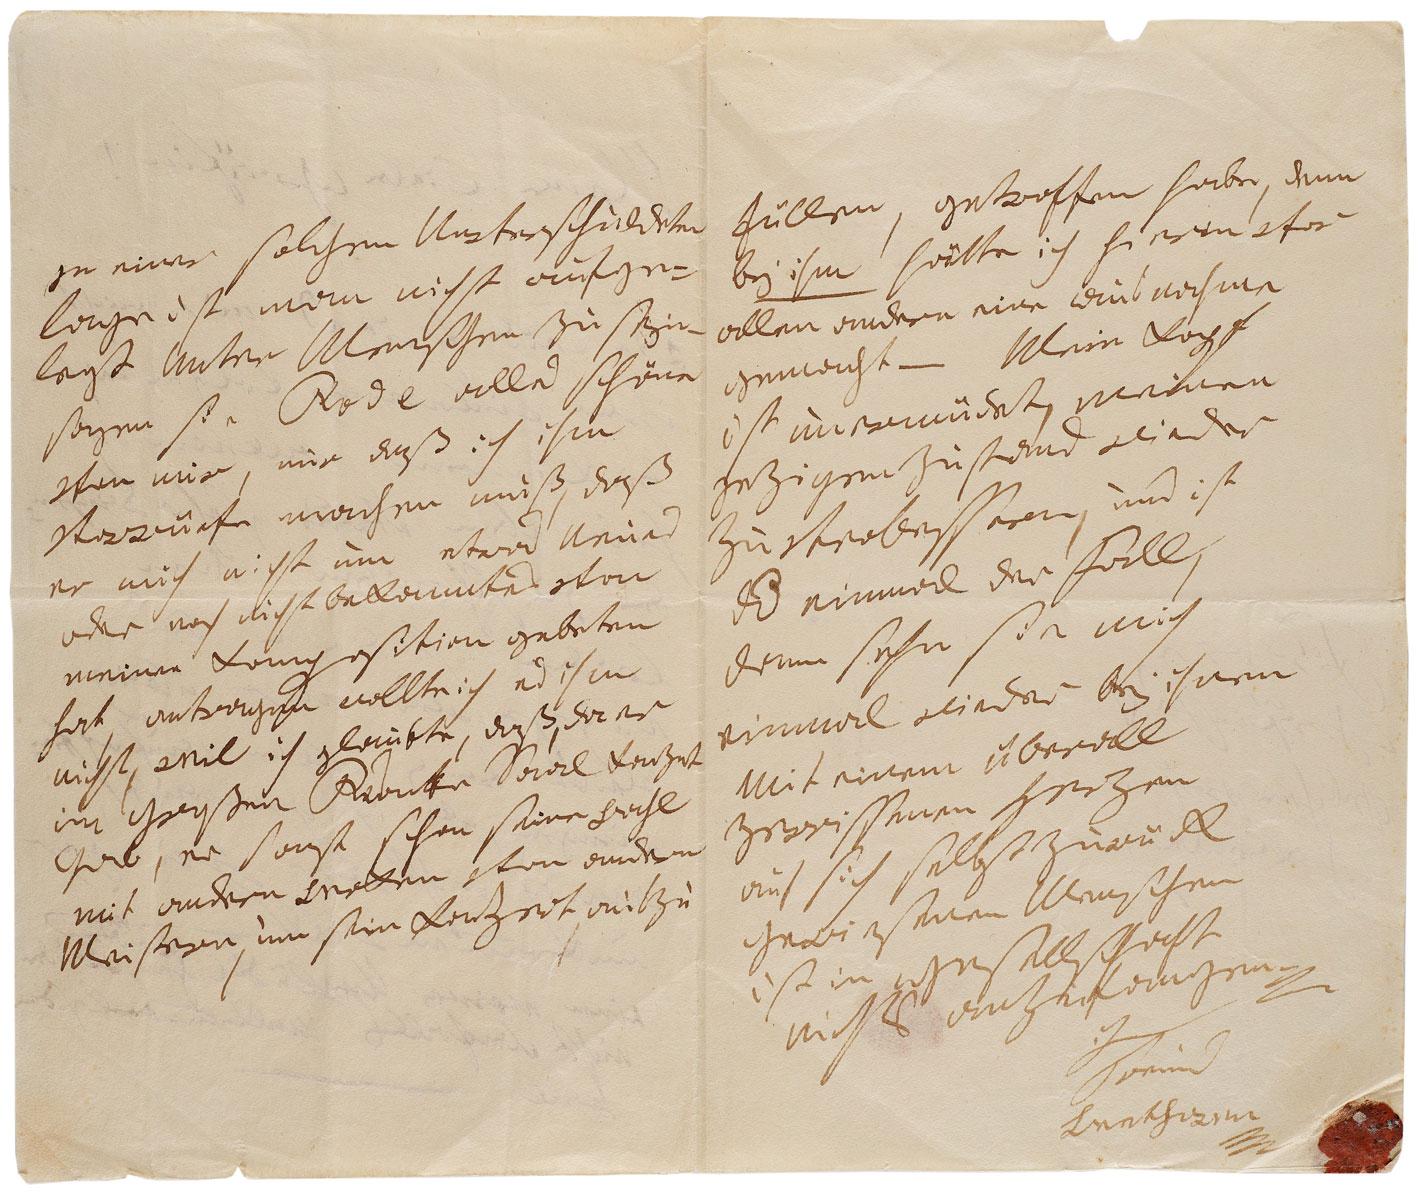 Ludwig van Beethoven, Brief an Maria Eleonora Gräfin Fuchs, Wien, Januar 1813, 21×12,3 cm; Beethoven-Haus Bonn © Beethoven-Haus Bonn